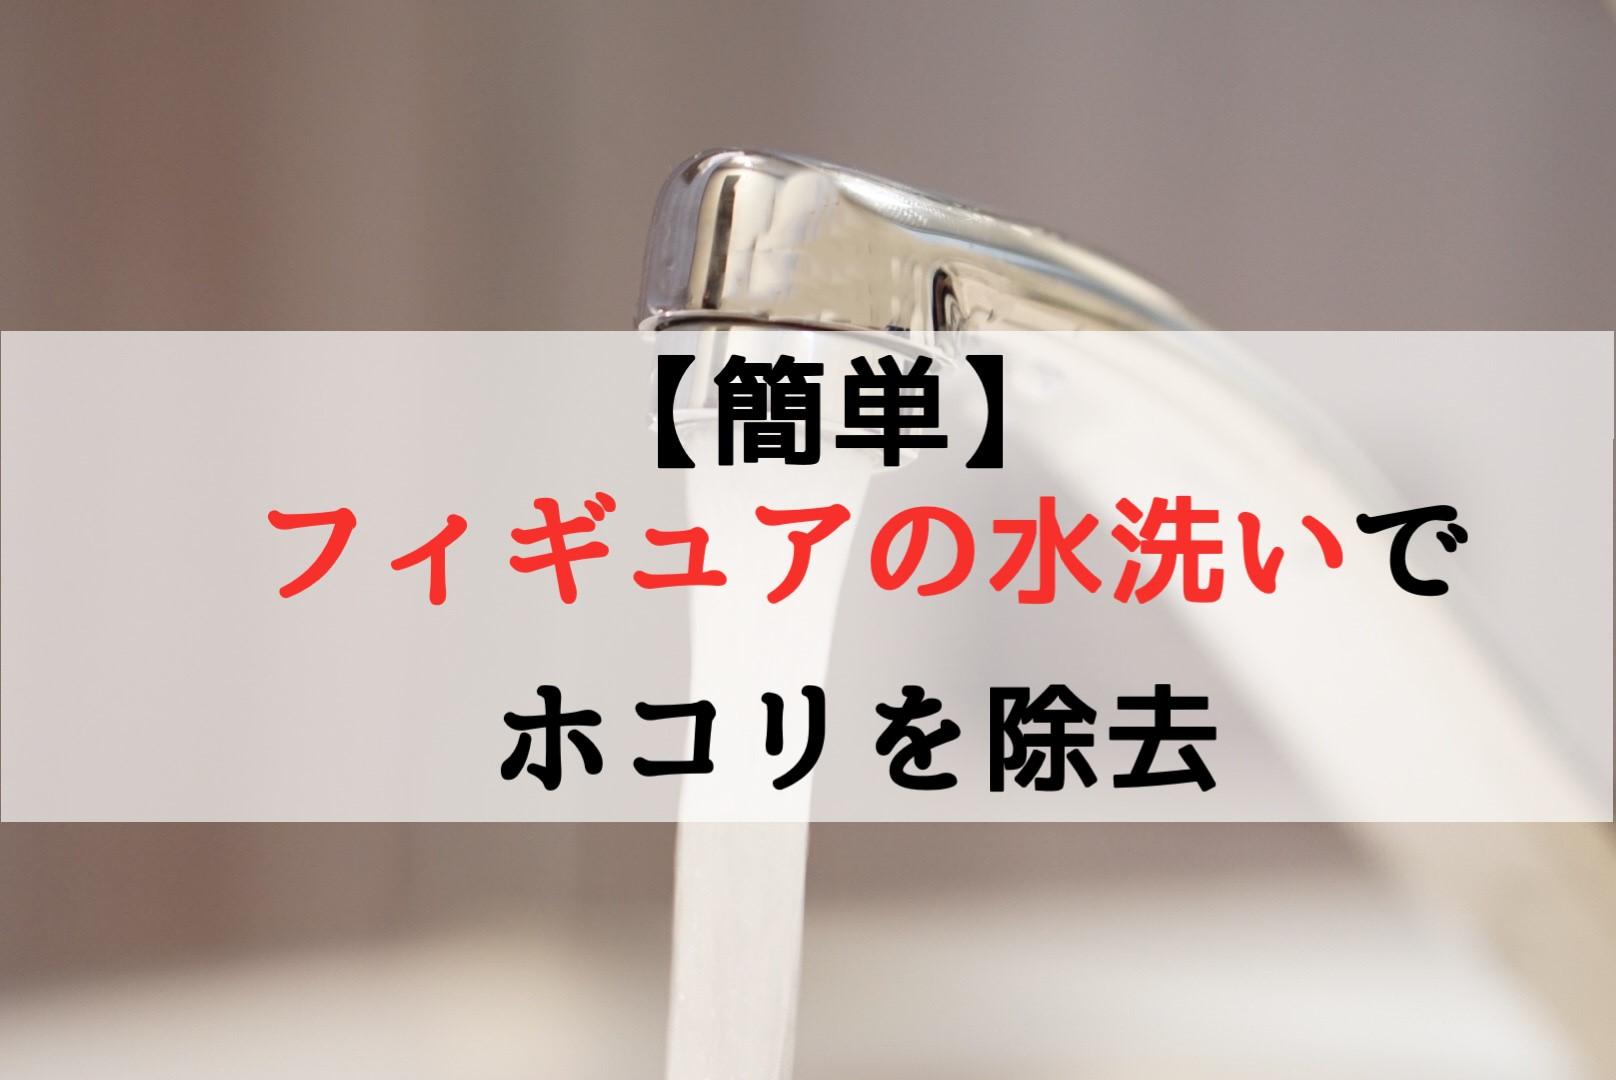 figure wash in water